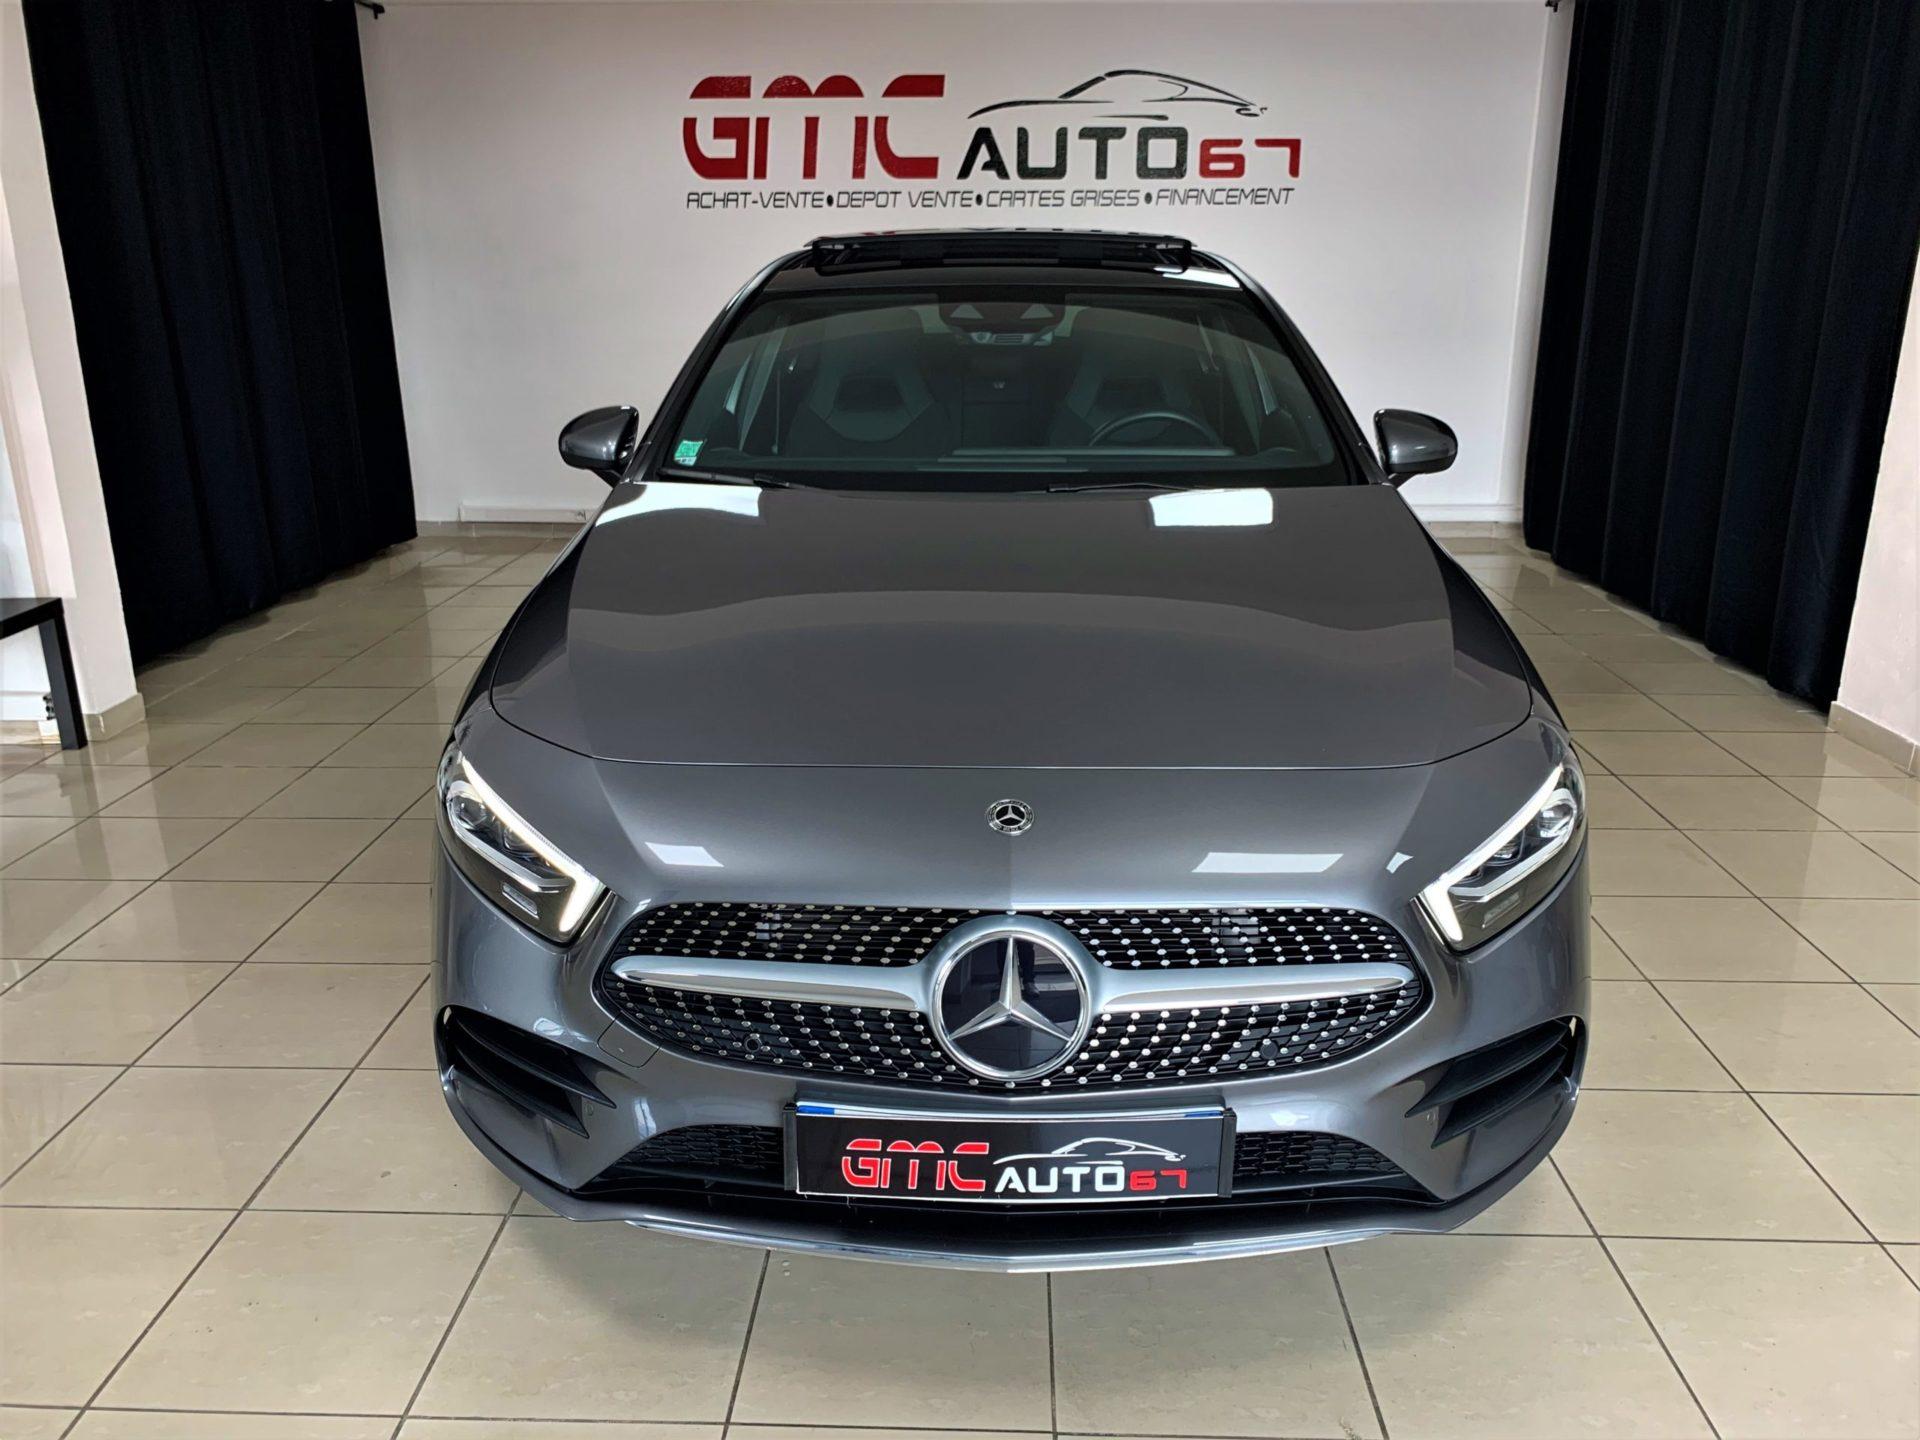 Mercedes Classe A 200 7G-DCT AMG Line - GMC AUTO 67